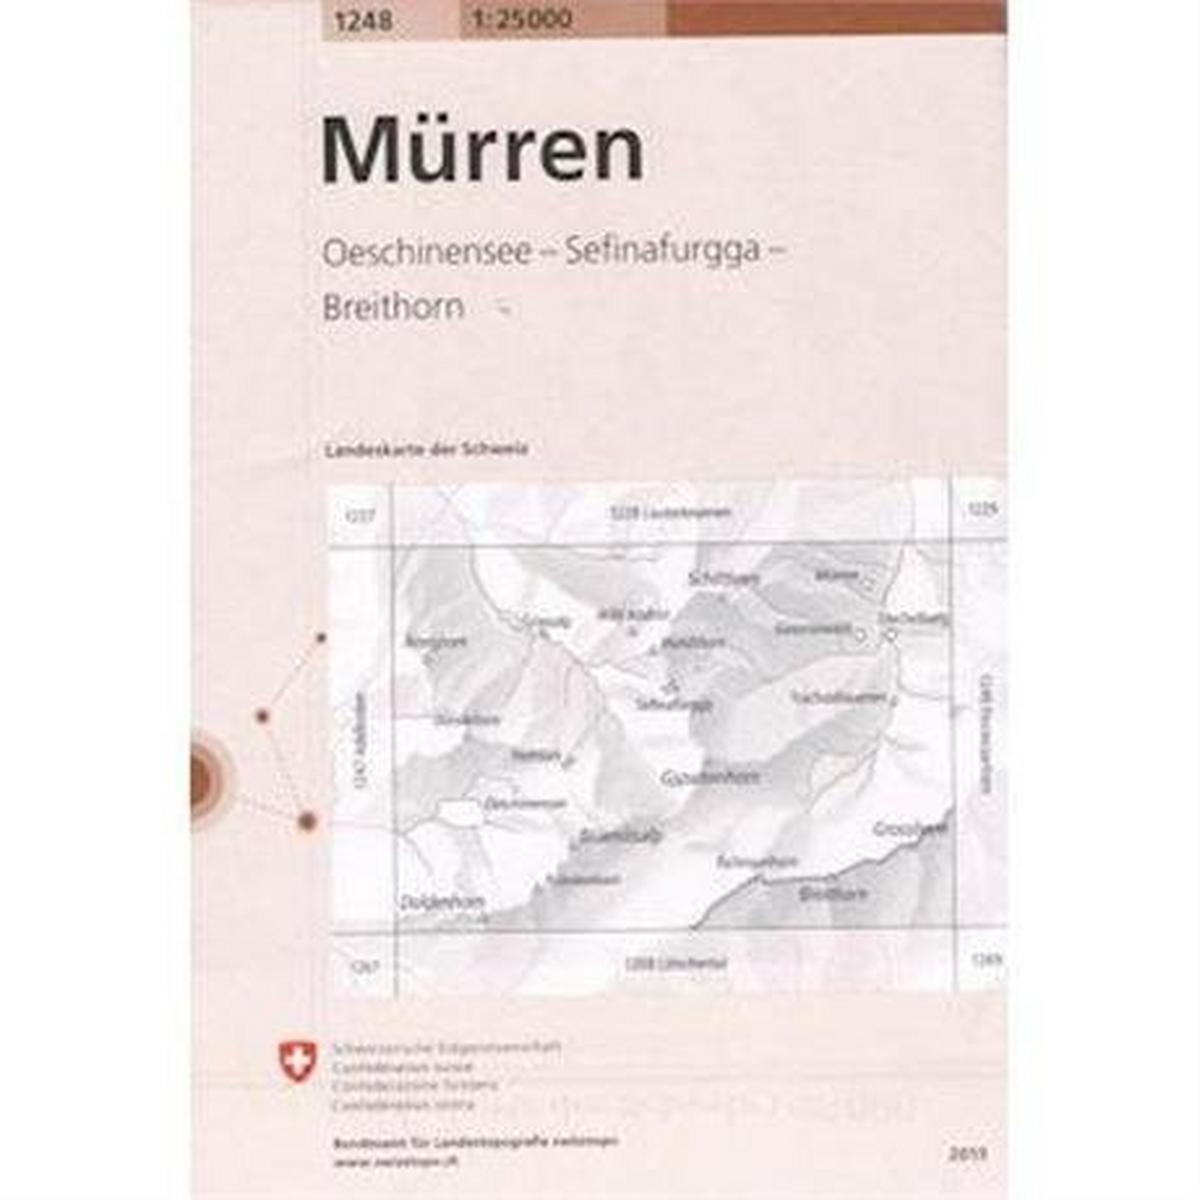 Miscellaneous Switzerland Map 1248 Murren